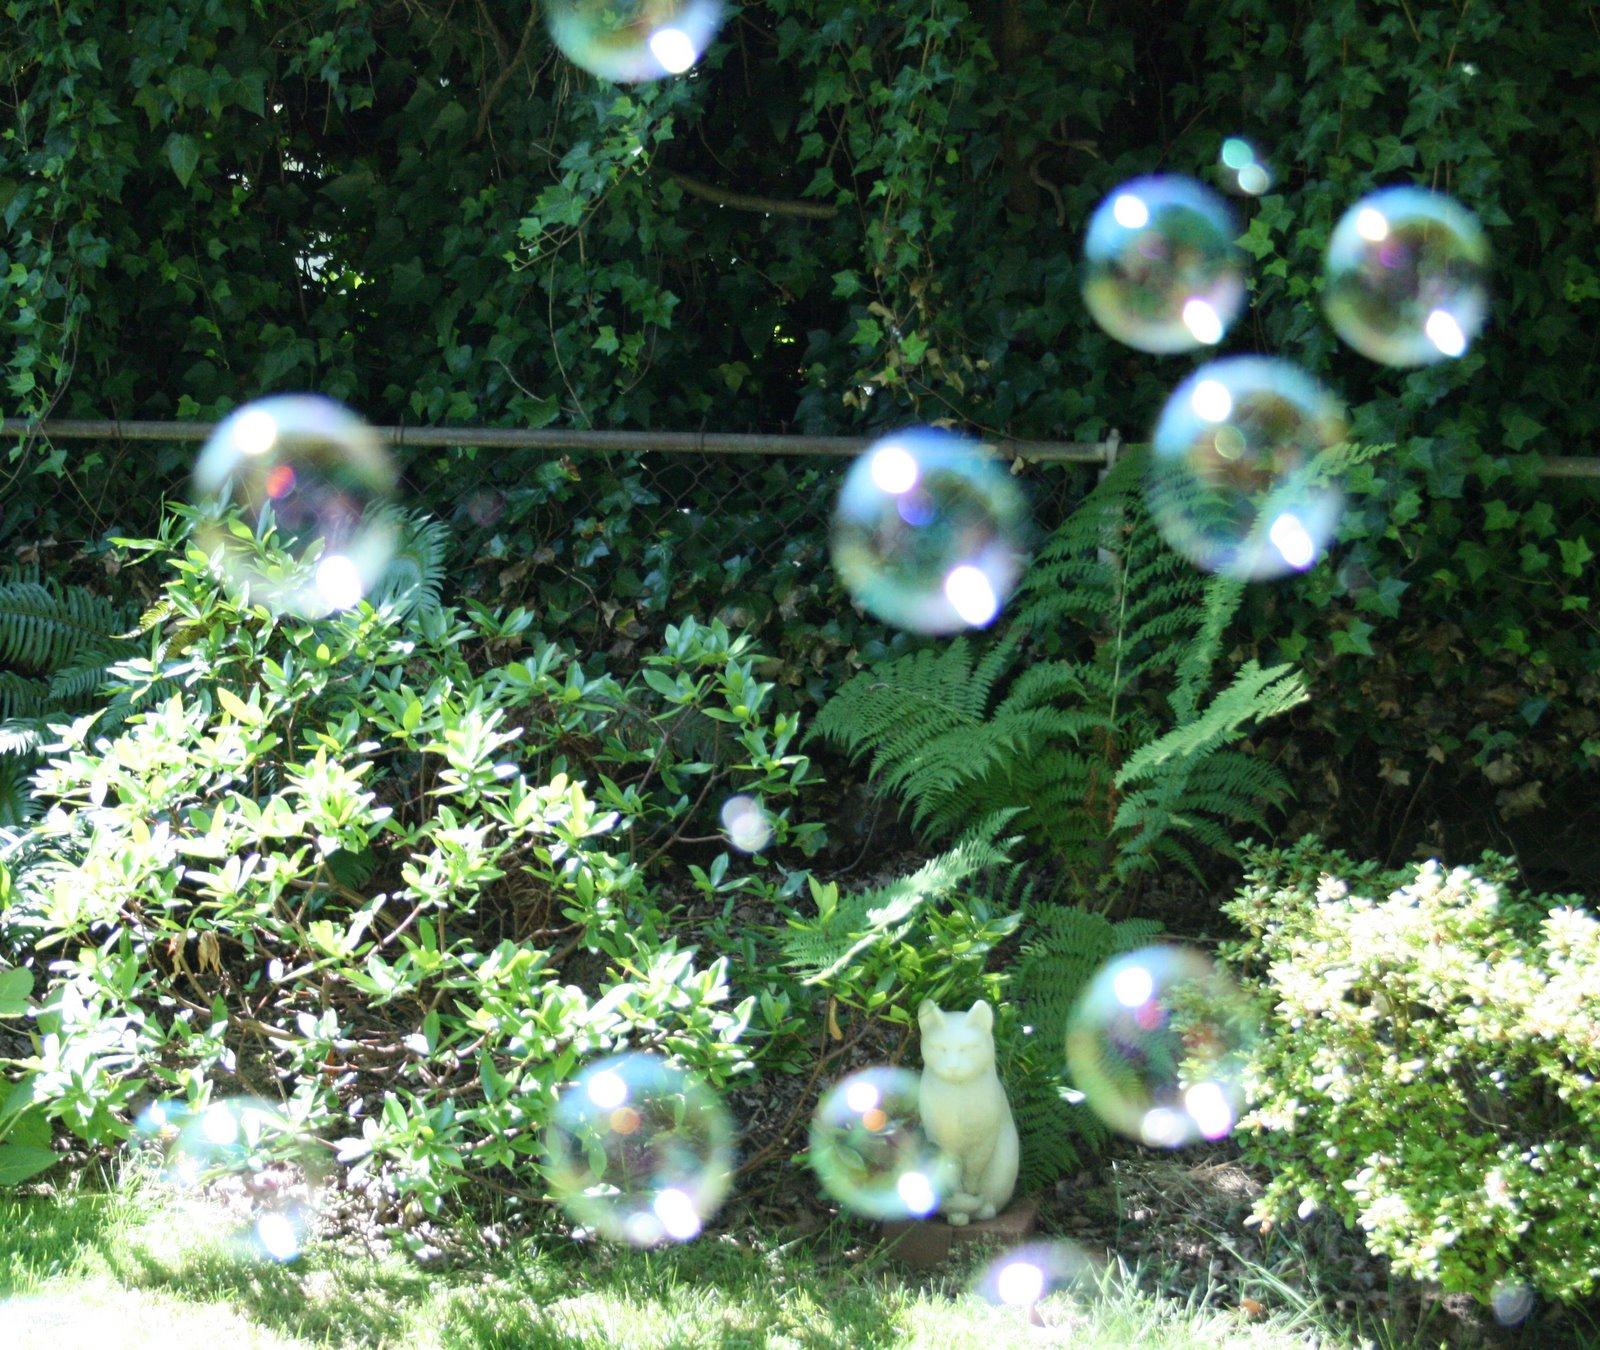 http://3.bp.blogspot.com/_vY53zchMjAg/TD9NmxhqARI/AAAAAAAAEms/j5CbOOGZmyA/s1600/bubbles+006.JPG